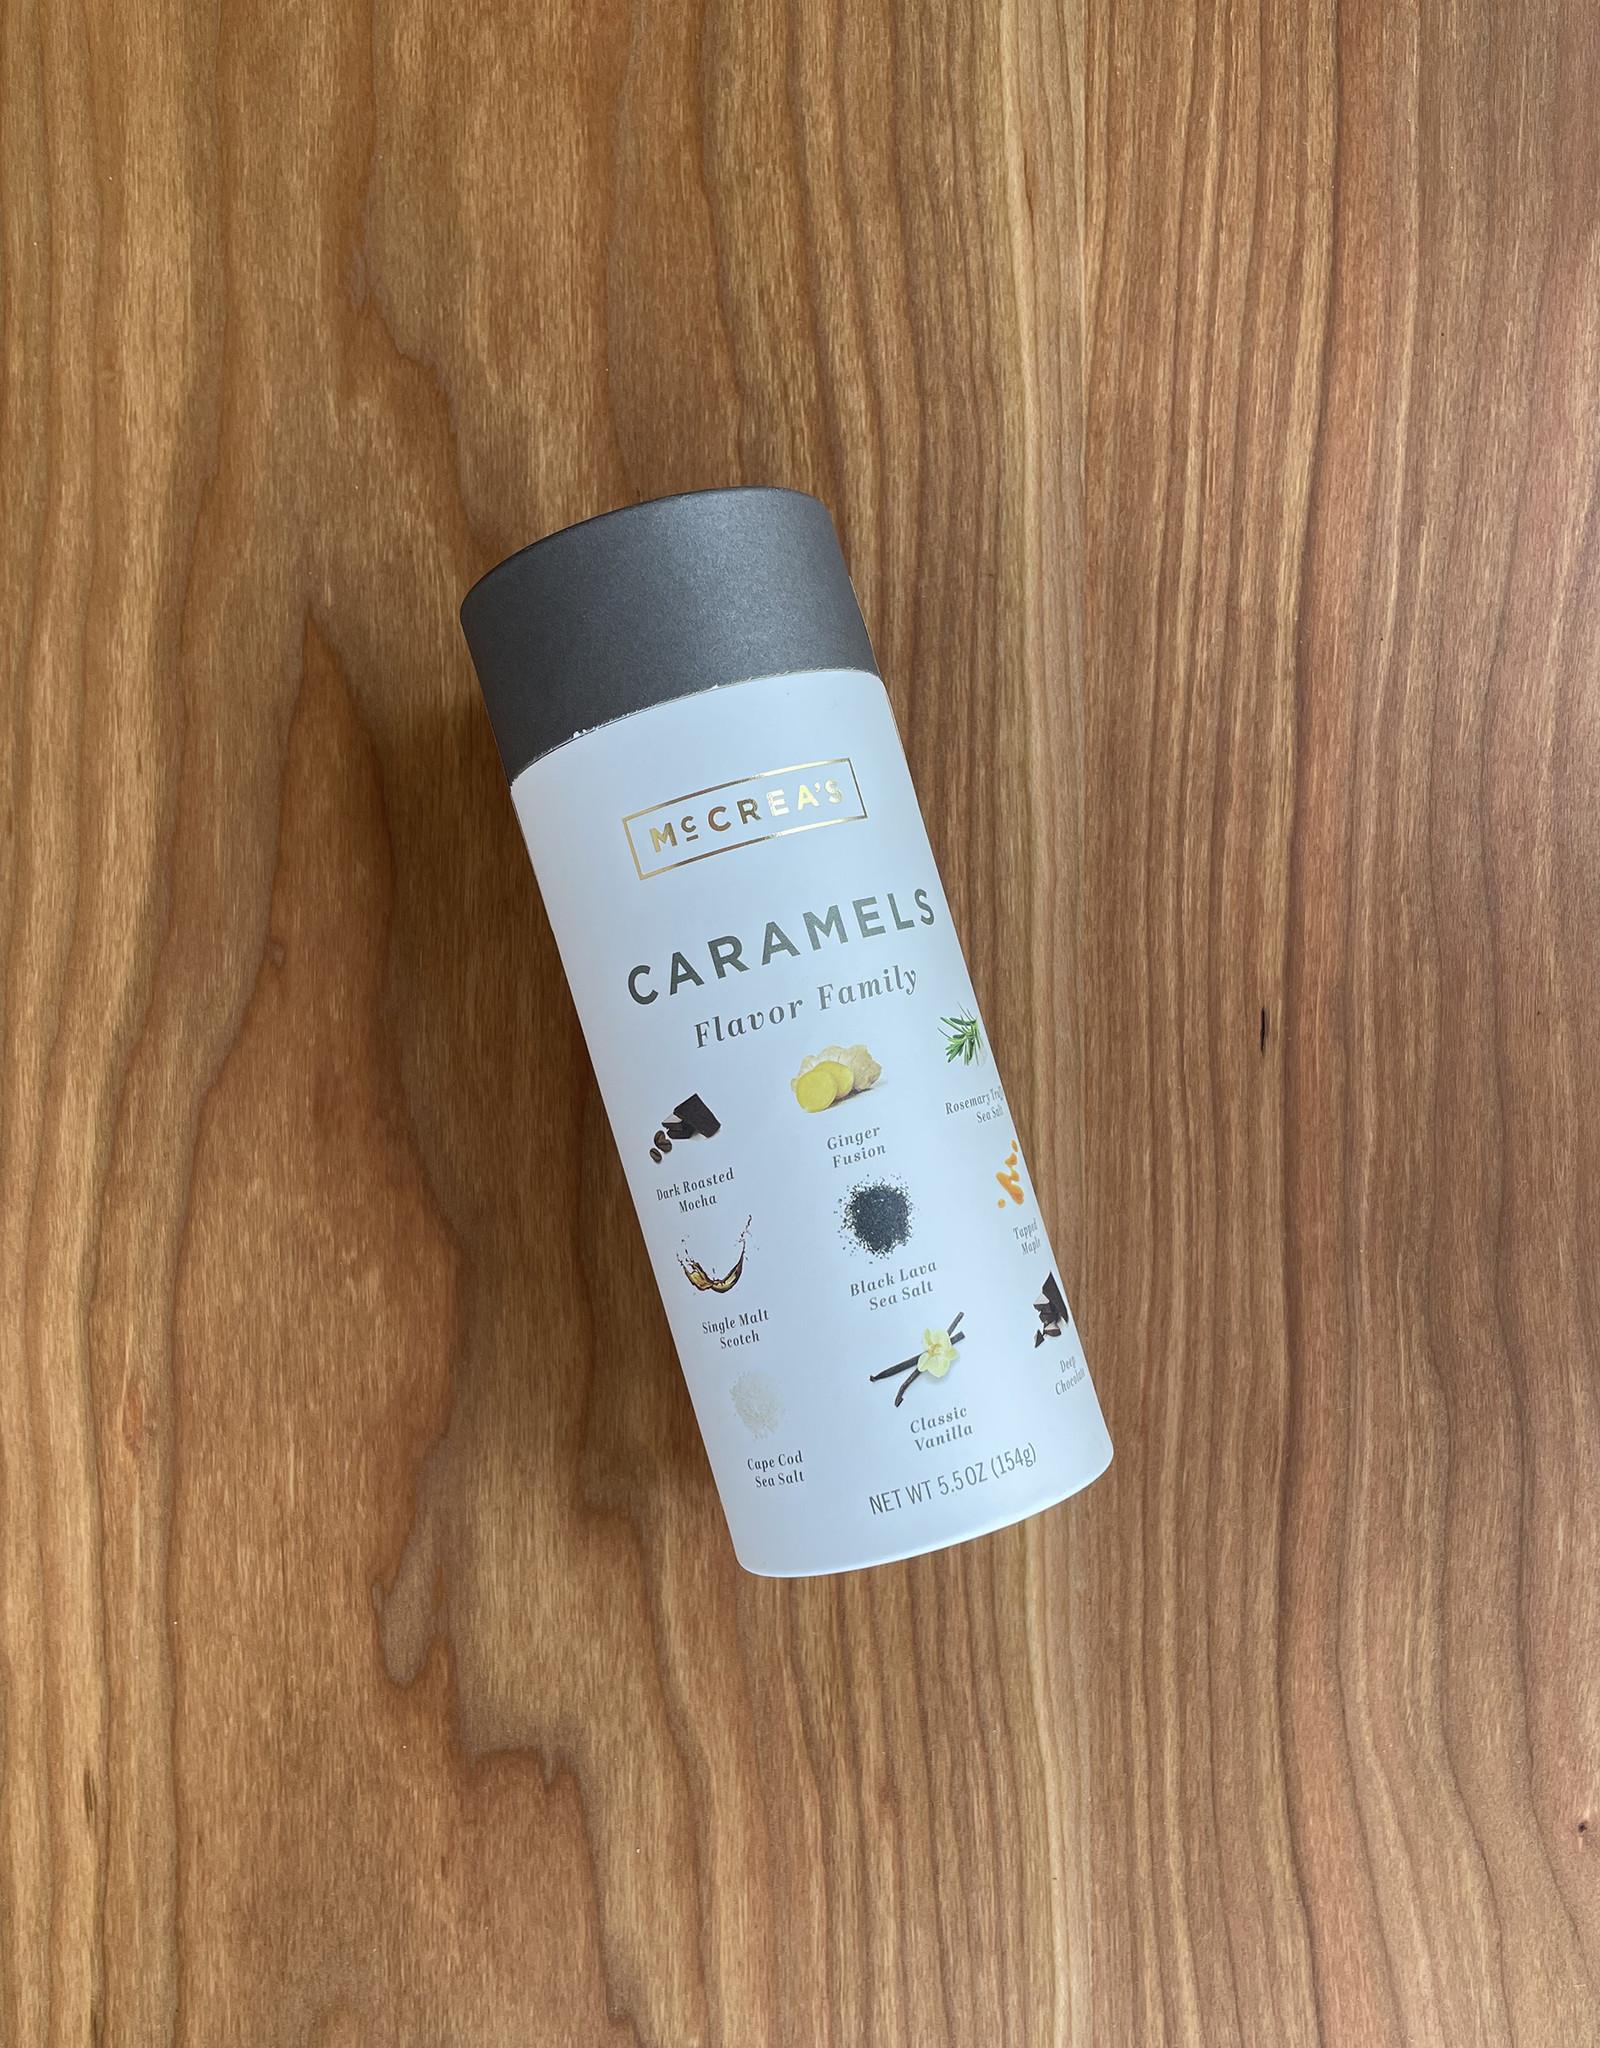 McCrea's Candies McCrea's Candies Caramel 5.5 oz tube Favor Family